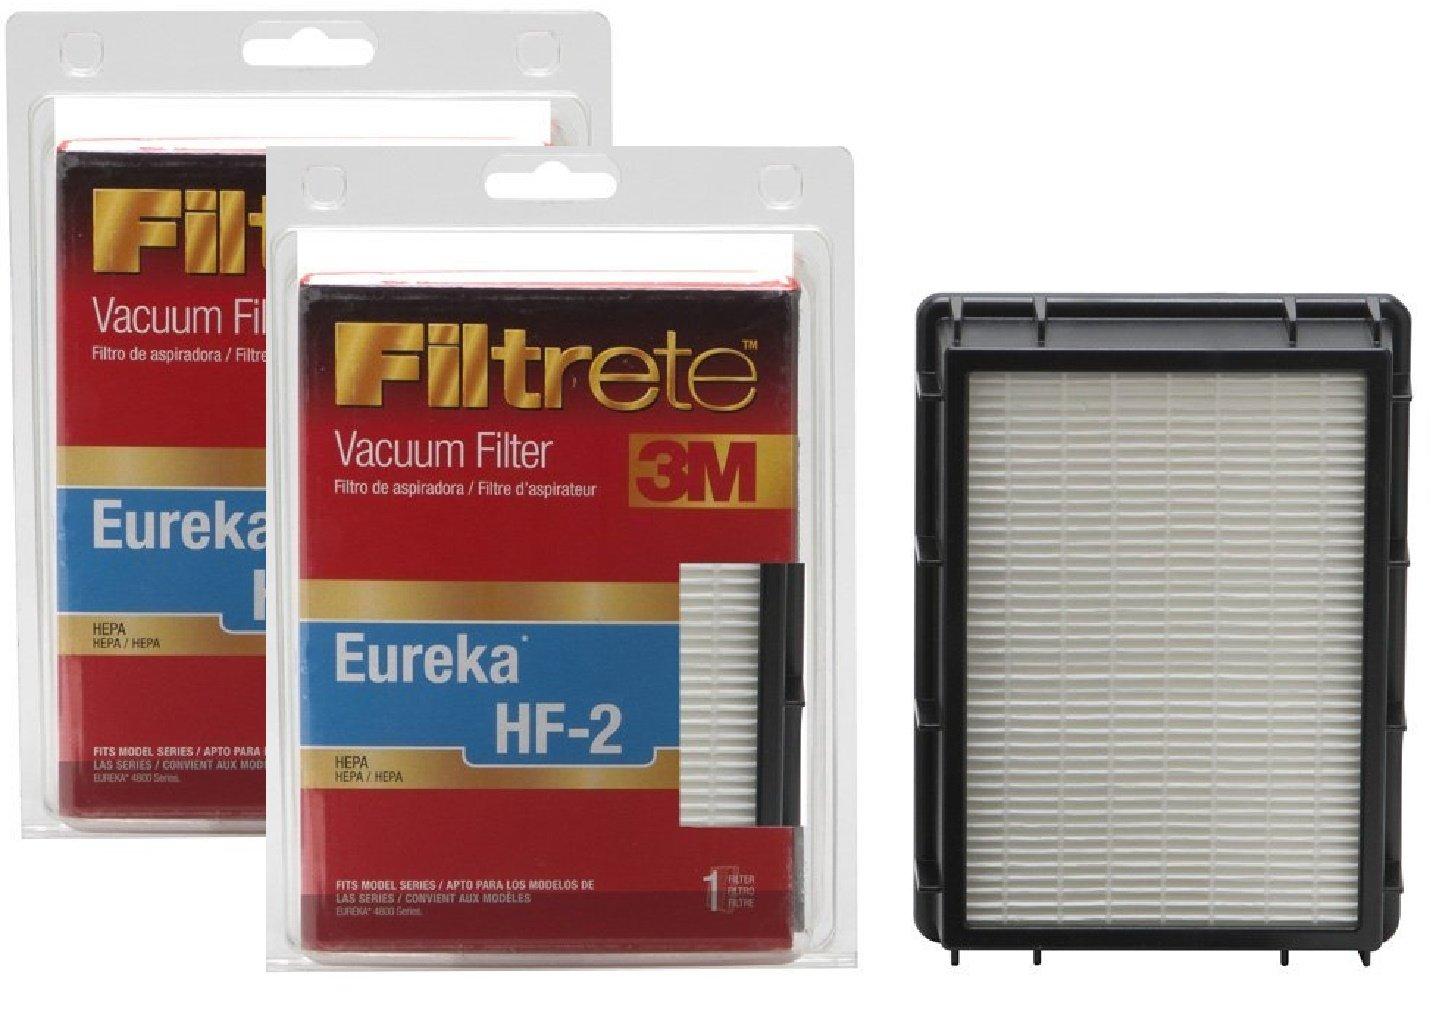 Amazon.com - 3M Filtrete Eureka HF-2 HEPA Vacuum Filter - 1 filter -  Household Vacuum Filters Upright